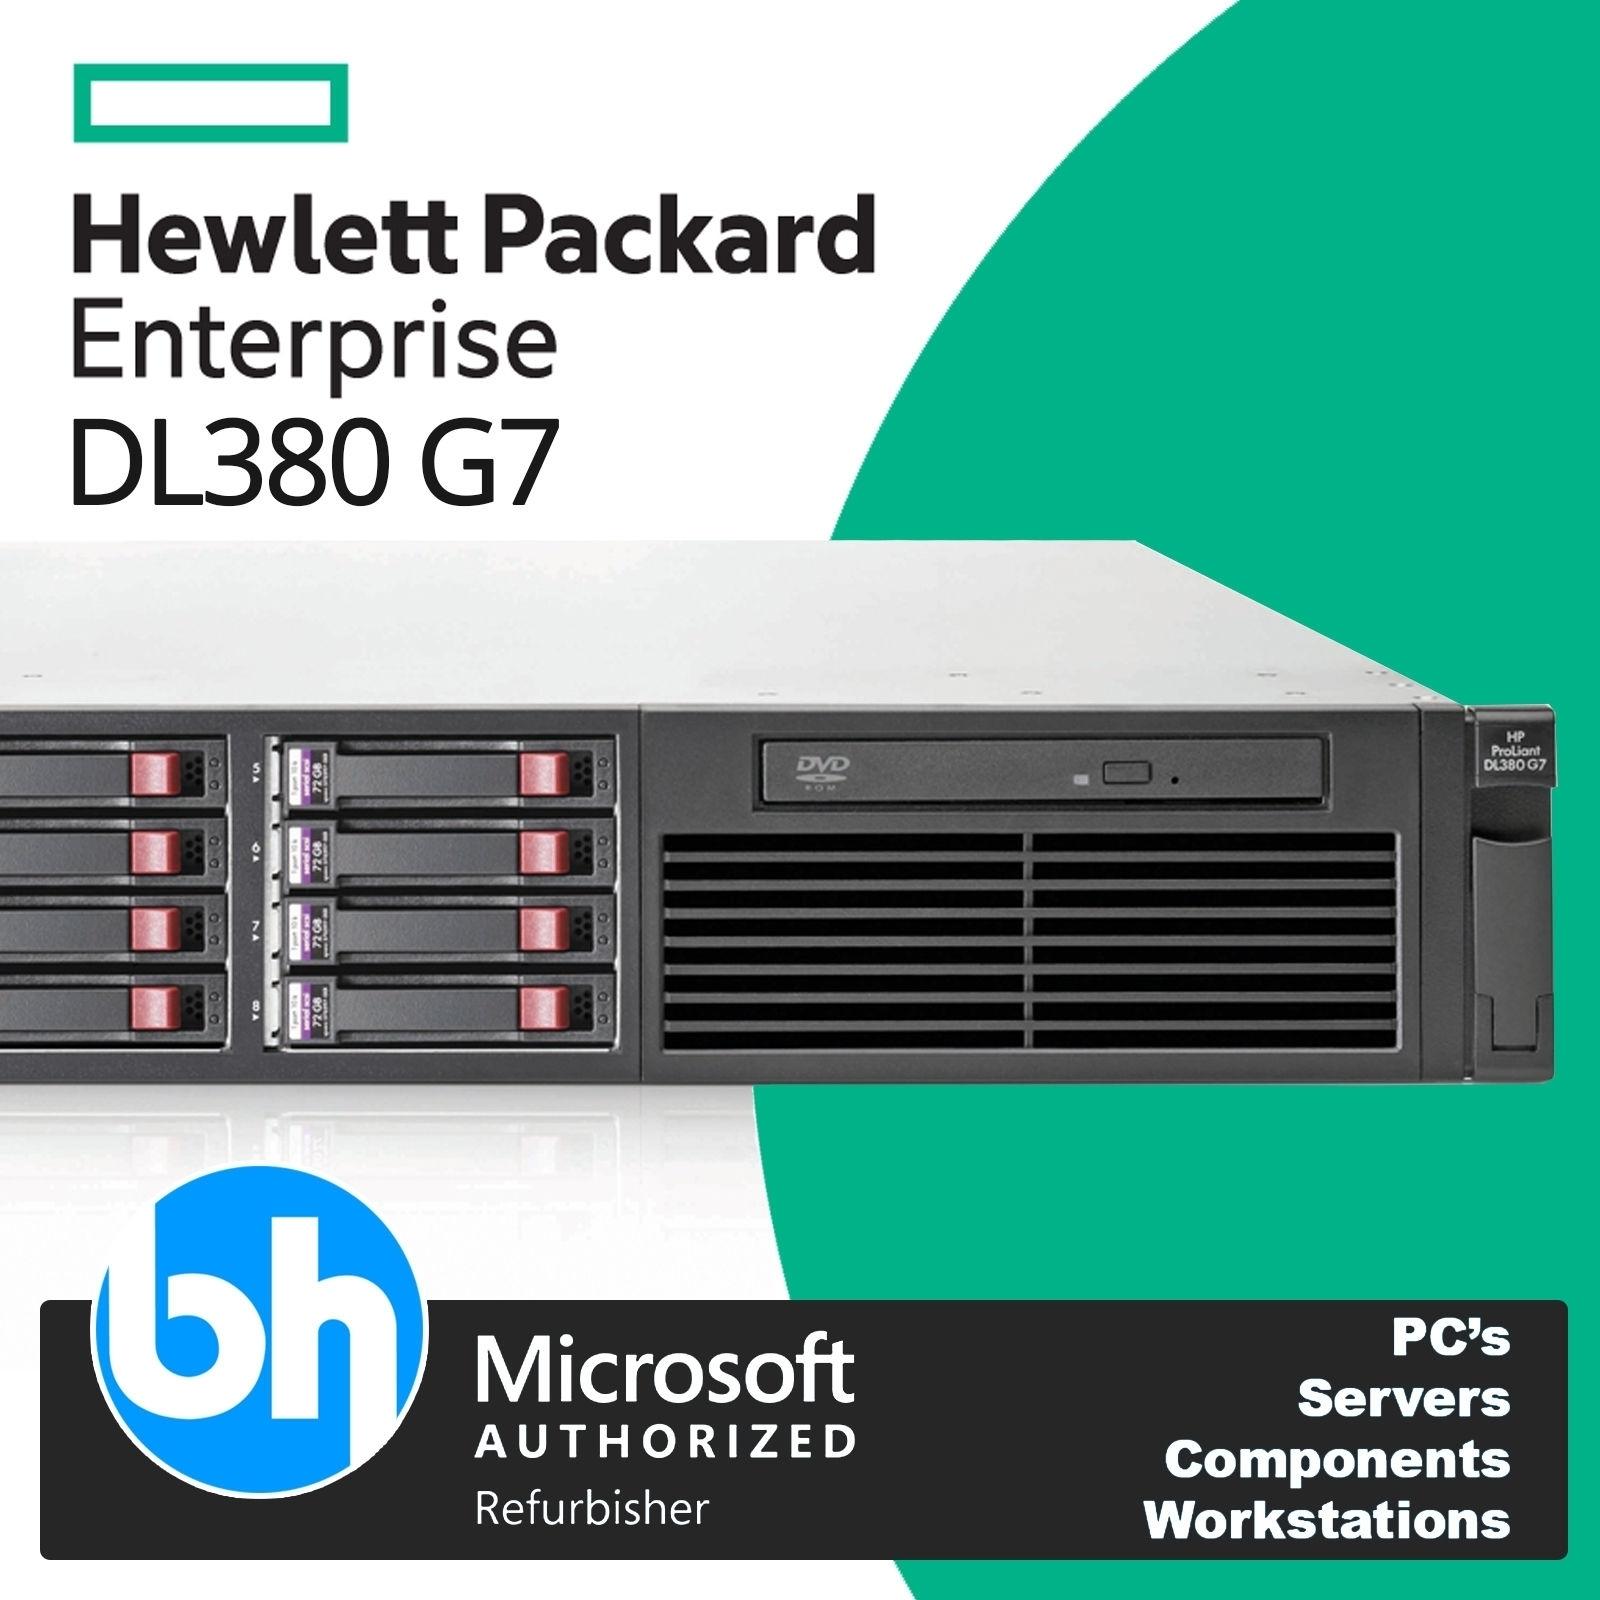 HP Proliant DL380 G7 SERVER 2x QUAD CORE E5620 2.40GHz 64GB RAM NO HDD